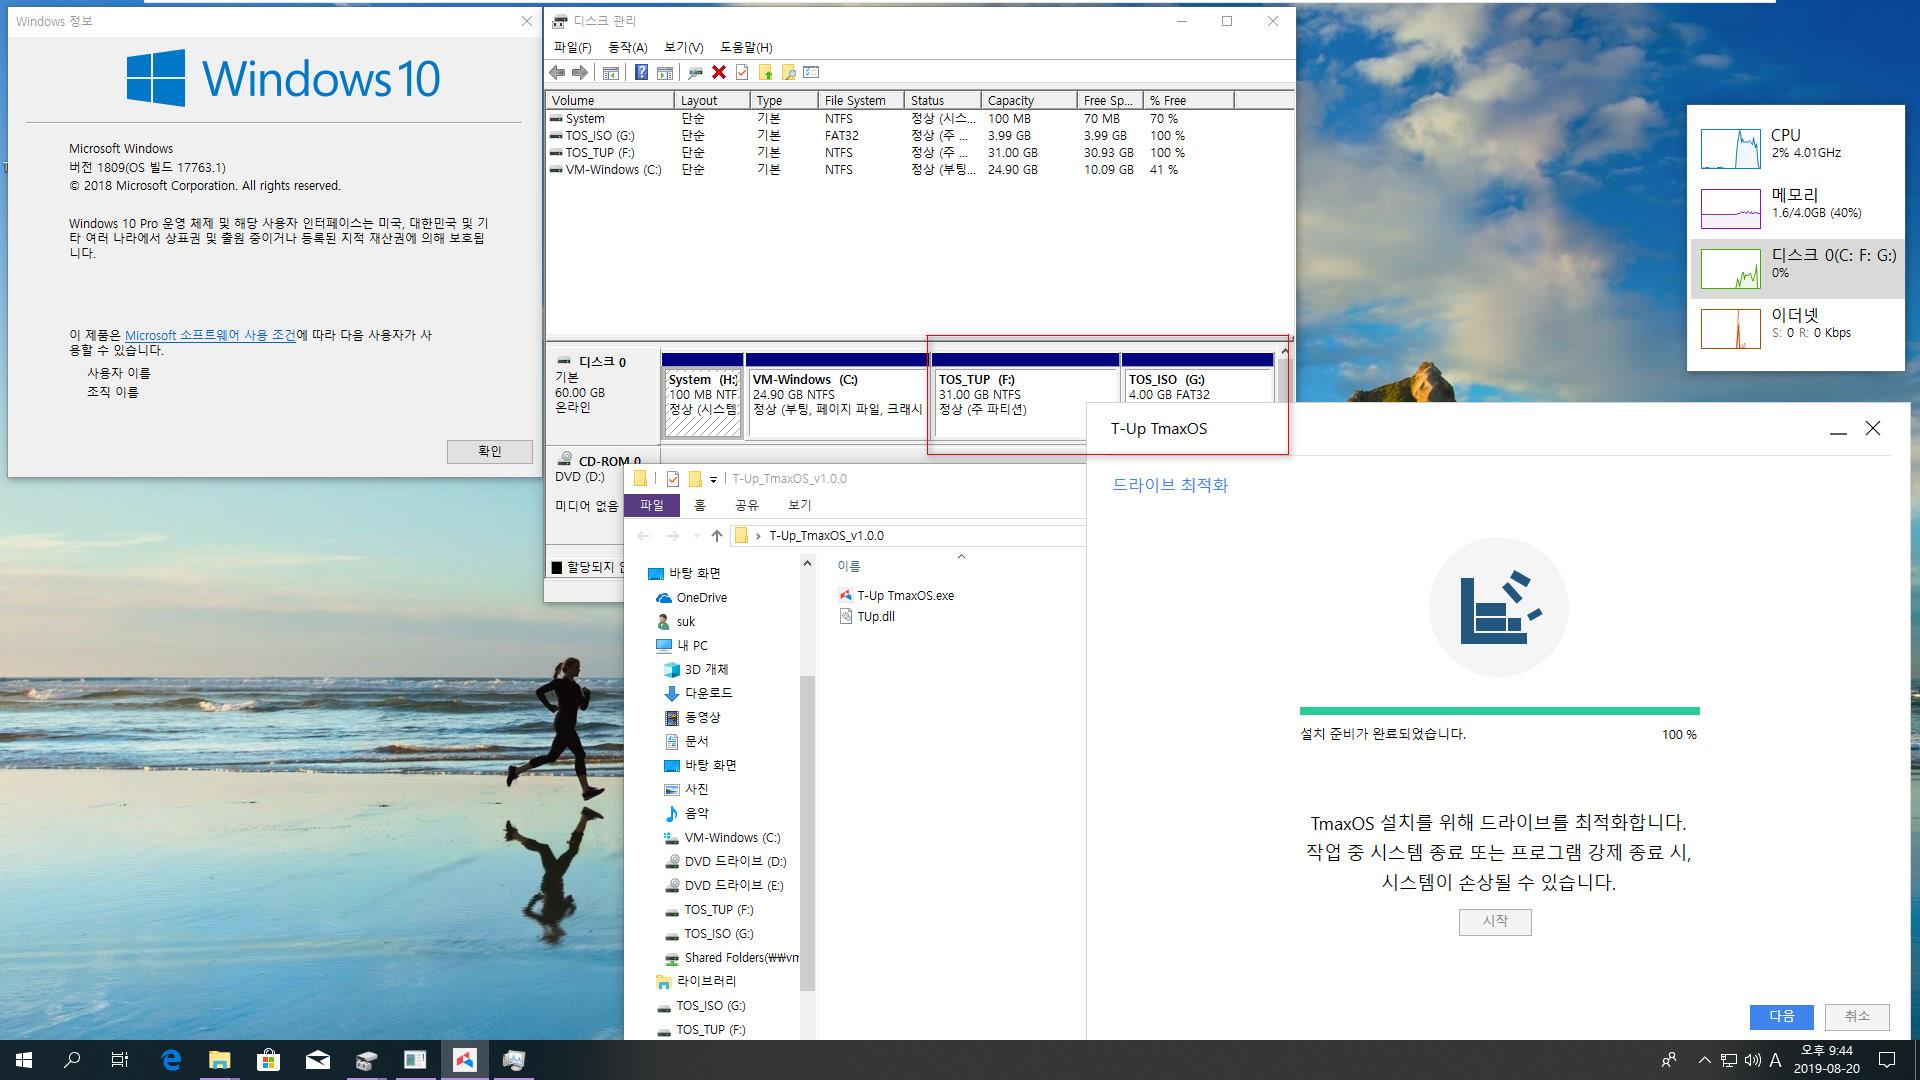 TmaxOS 설치 테스트 - 2번째 시도 - 이번에는 윈도에서 Tmax에서 제공한 T-Up TmaxOS.exe 으로 멀티 부팅으로 설치하기 2019-08-20_214439.jpg